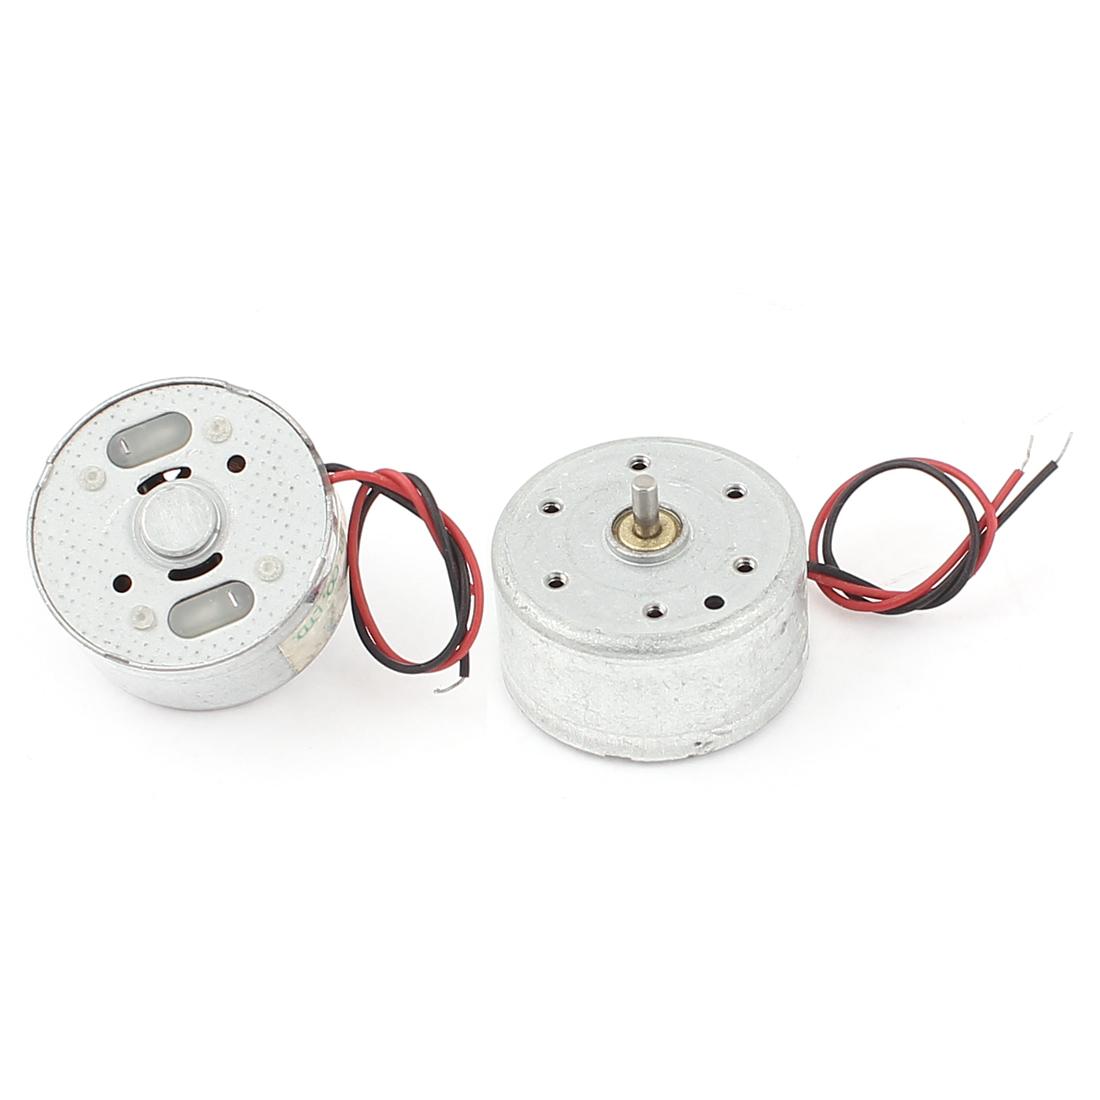 2 Pcs 1.5-3V 2700RPM Torque Magnetic Mini DC Motor for CD DVD Player